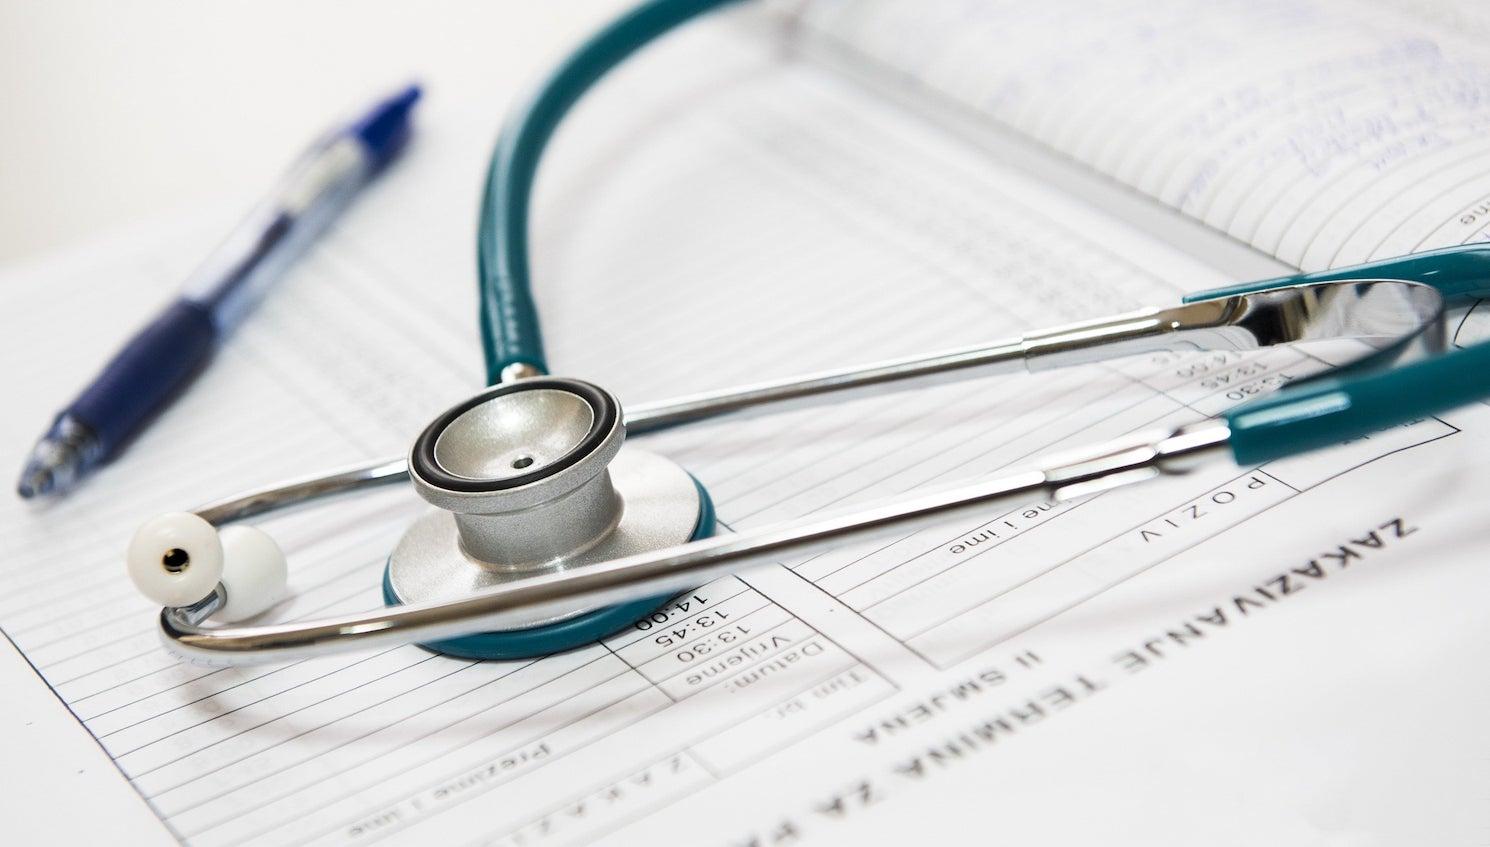 AI in Healthcare - stethoscope